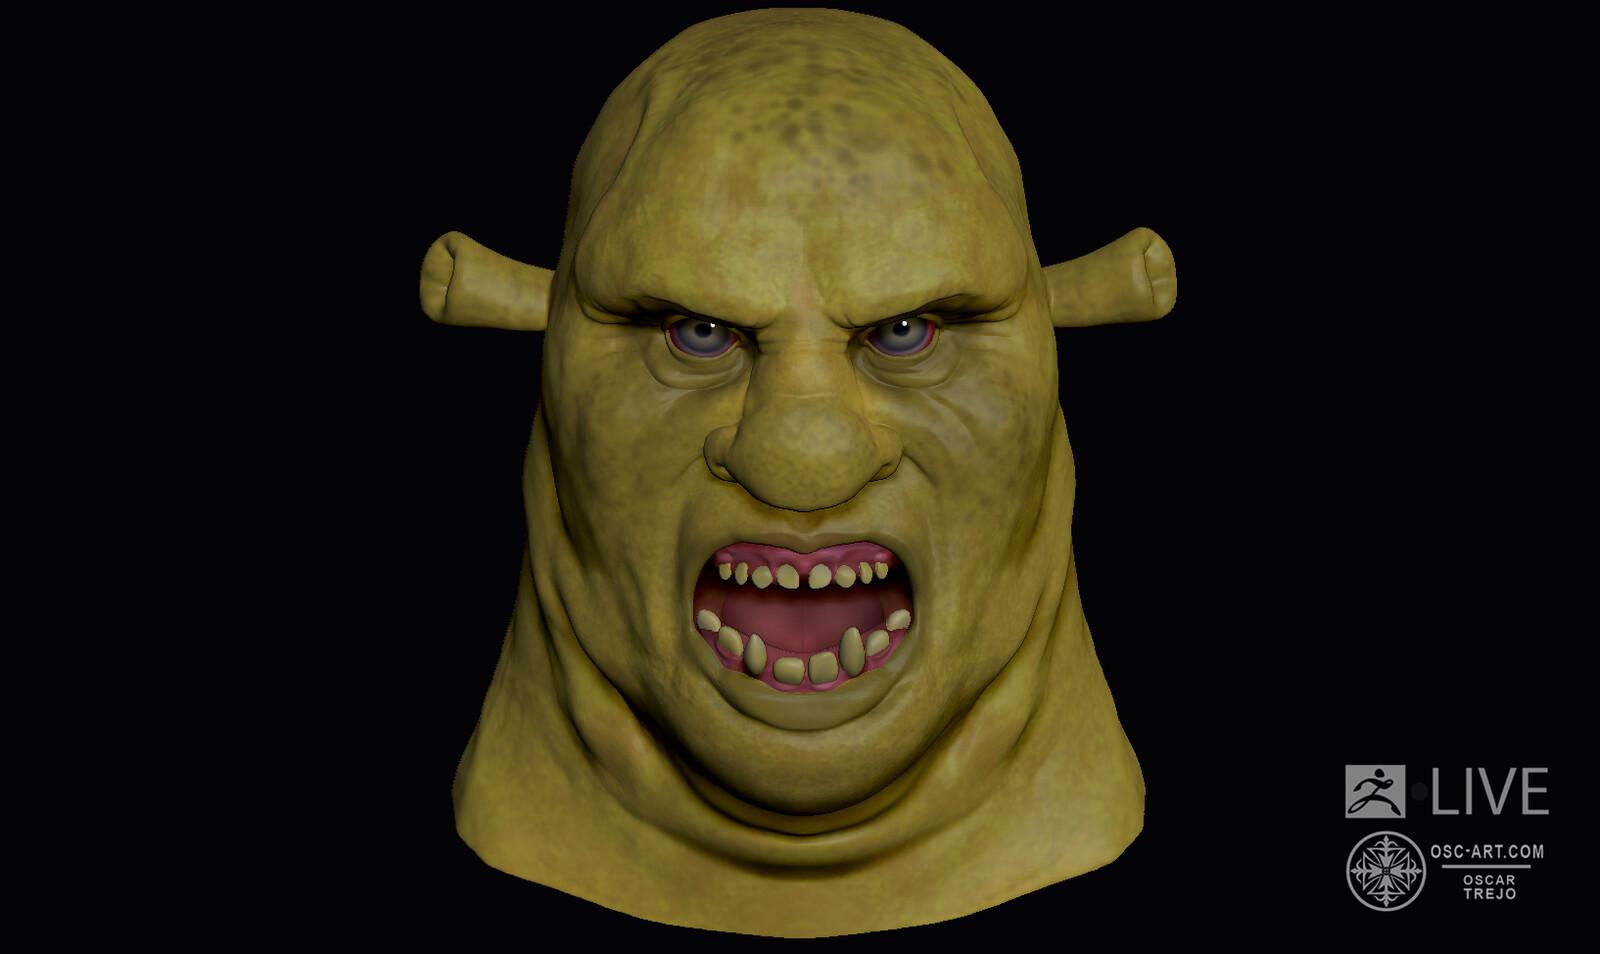 Stream 75 Shrek